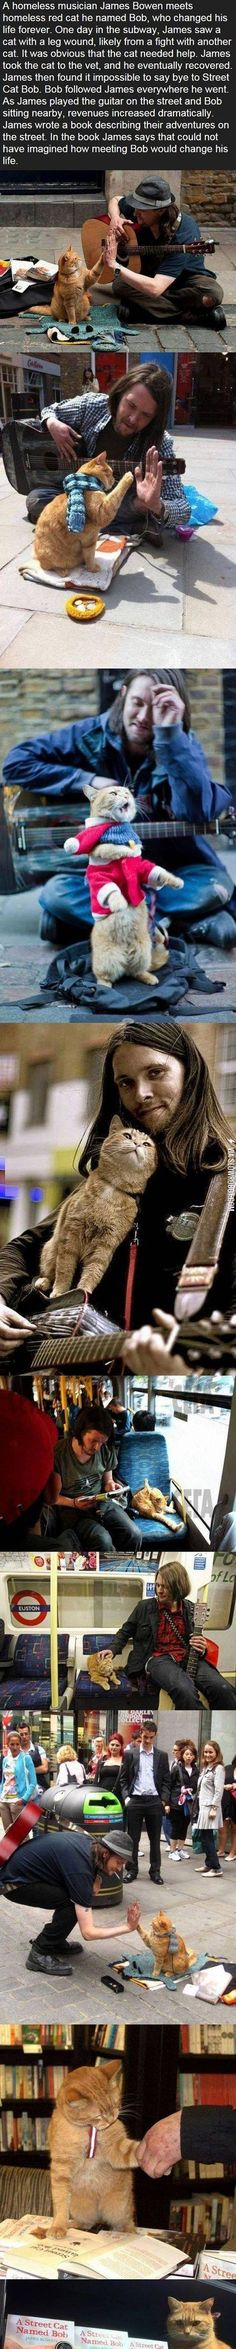 A street cat named Bob.